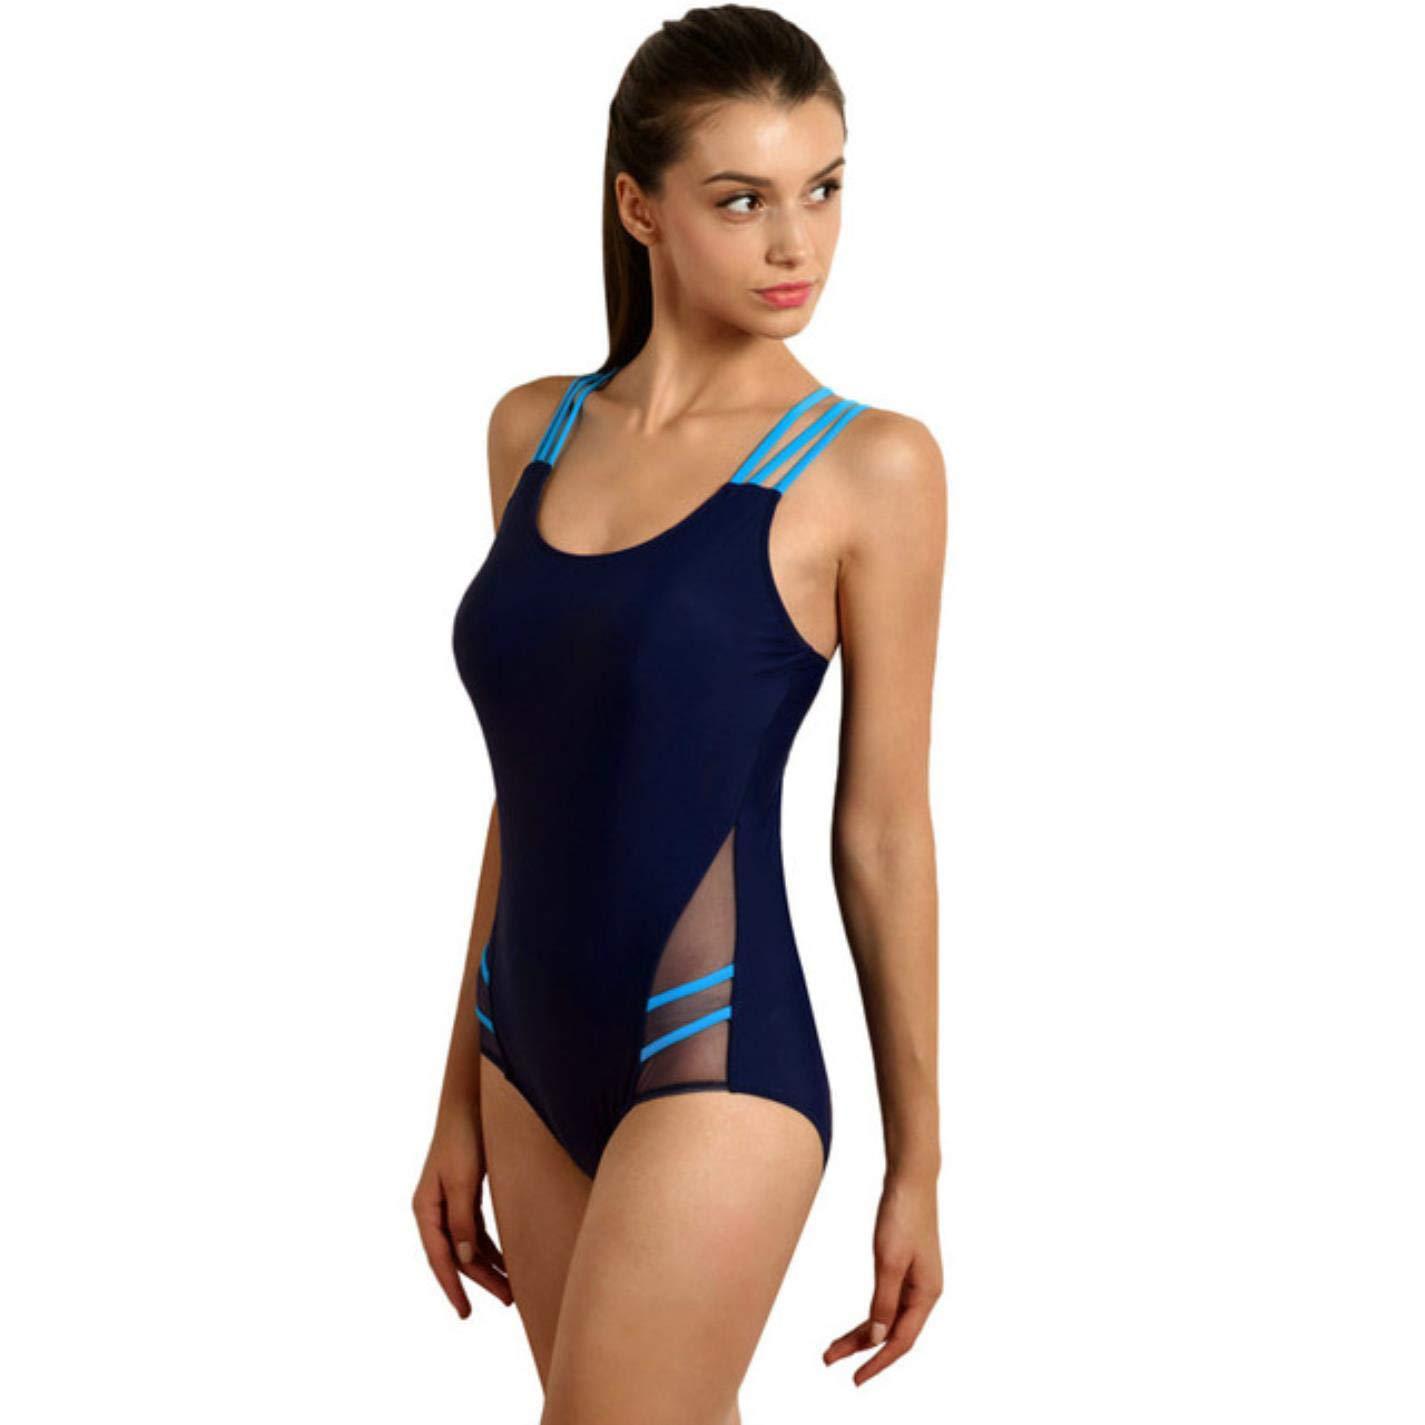 Women Sexy Training One Piece Swimsuits Cross Bandage Mesh Swimwear